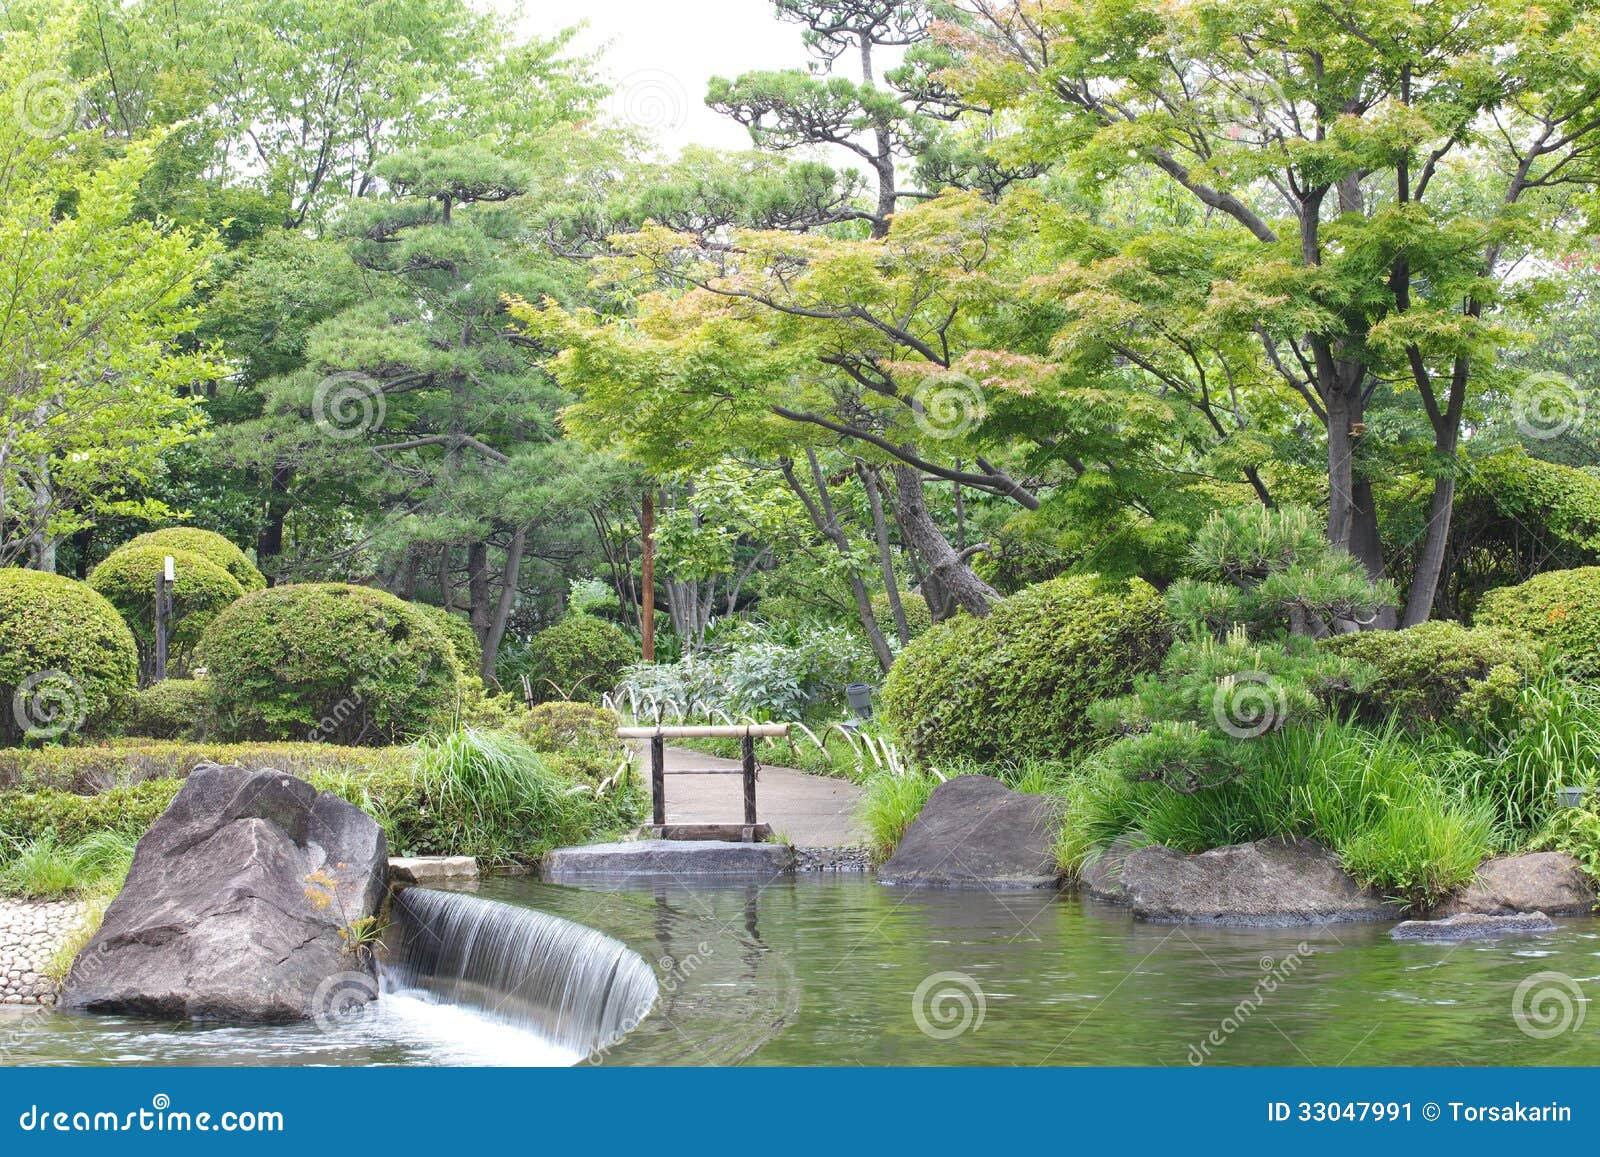 Japanese garden stock image image 33047991 for Creating a small japanese garden